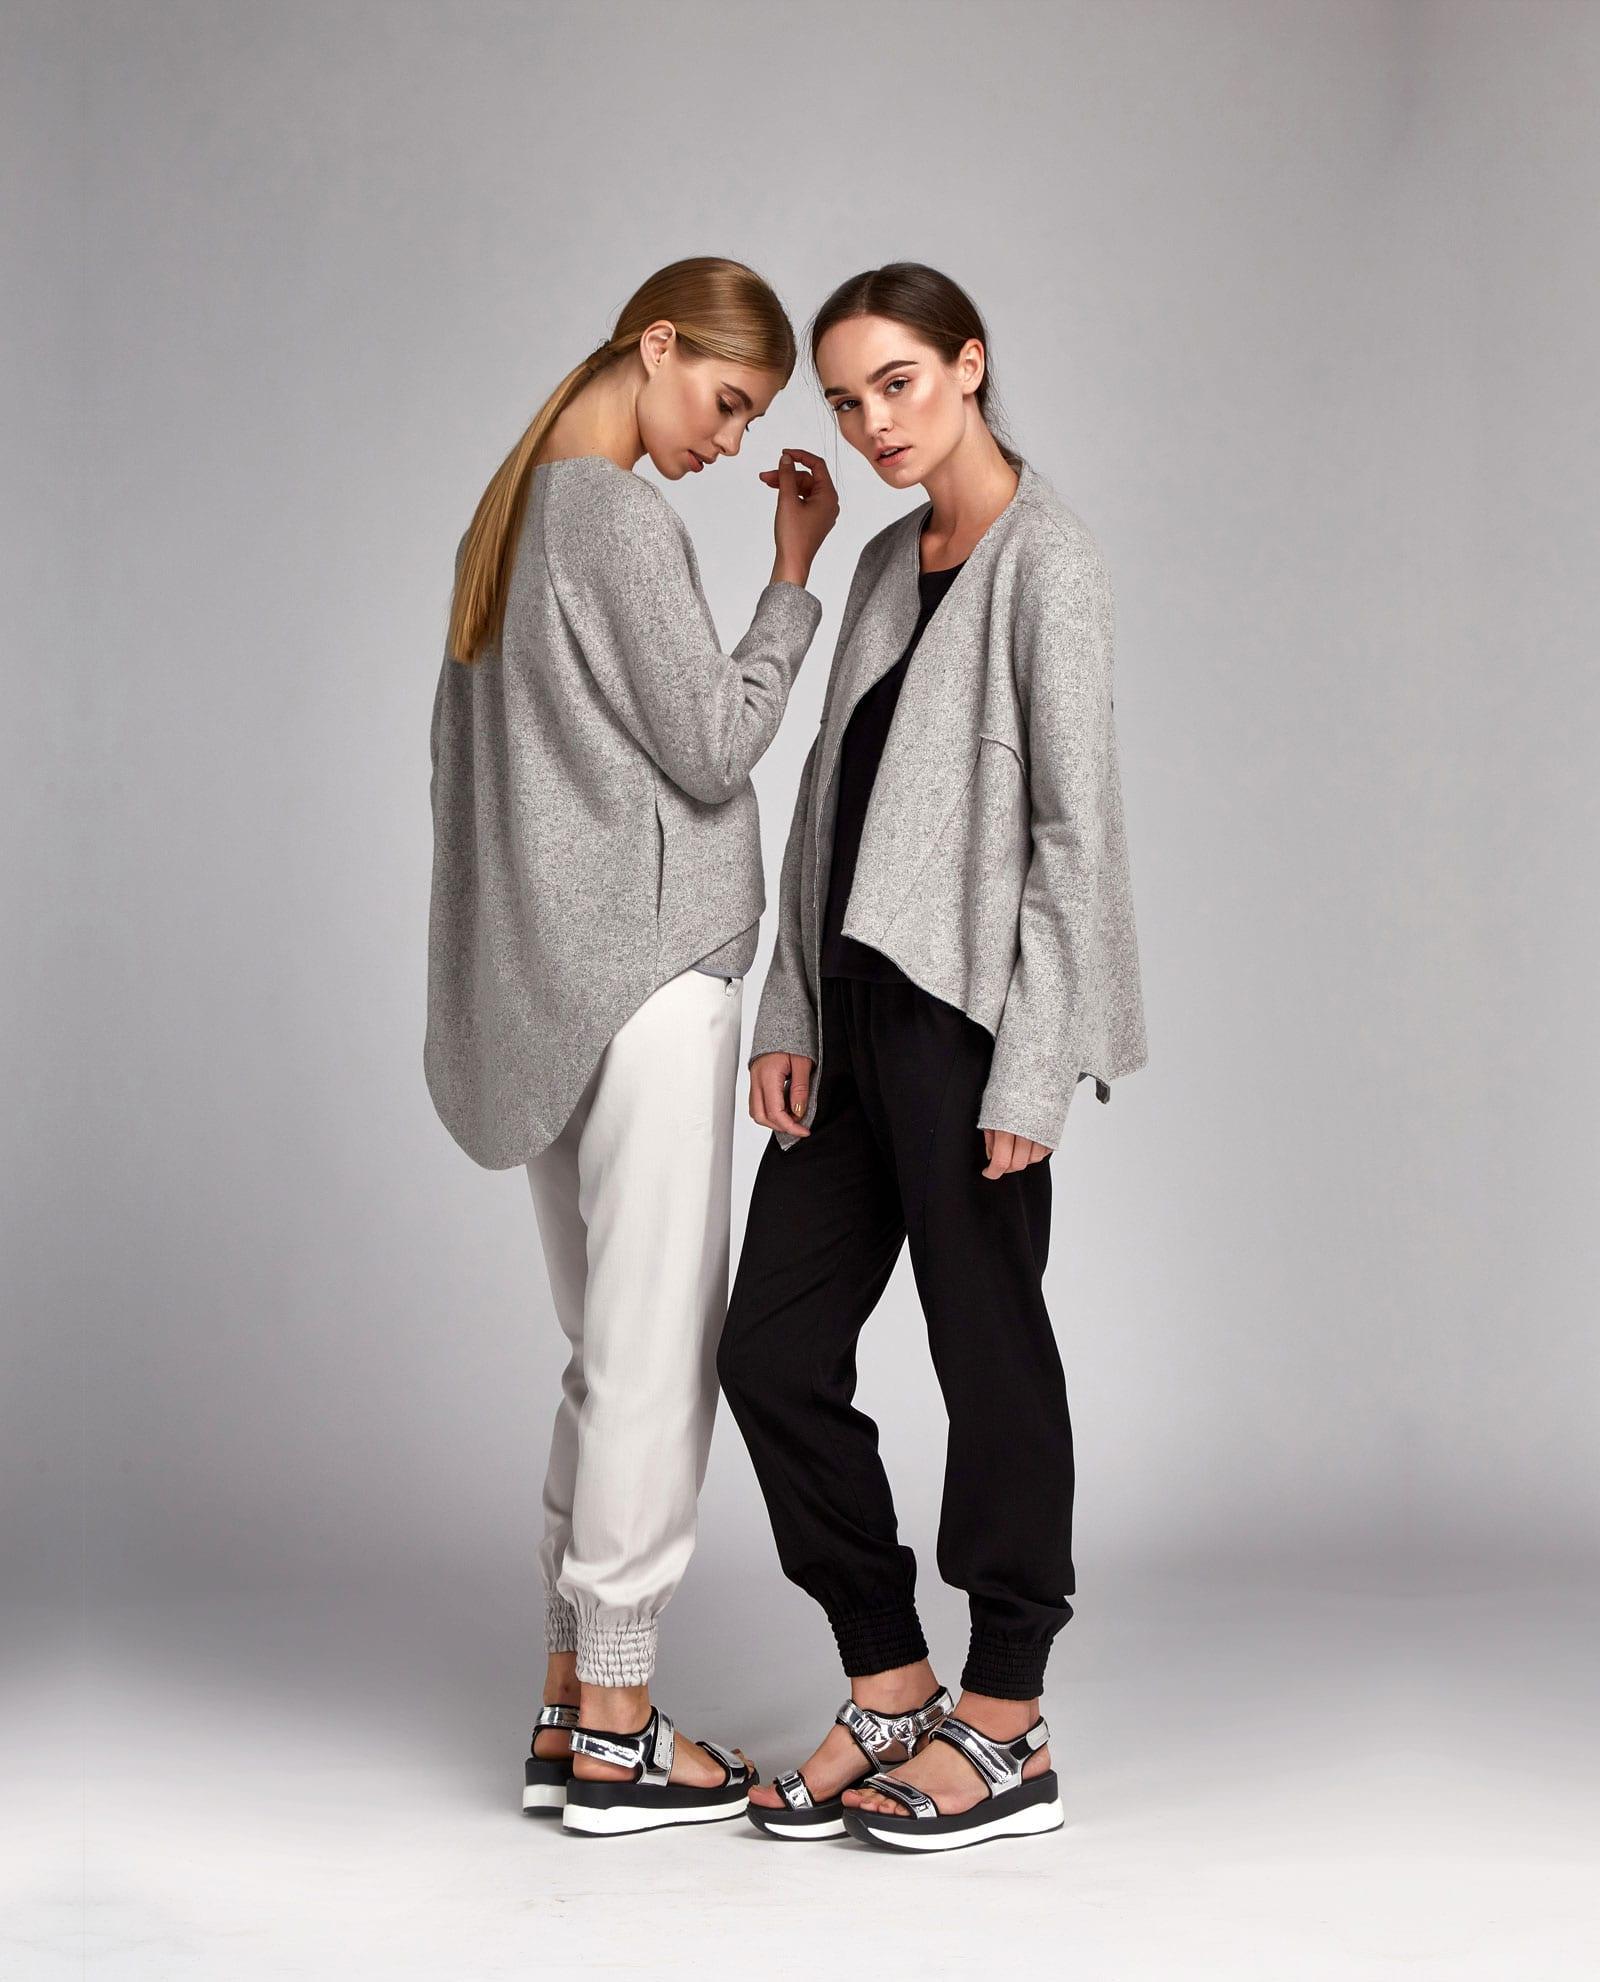 gray top05